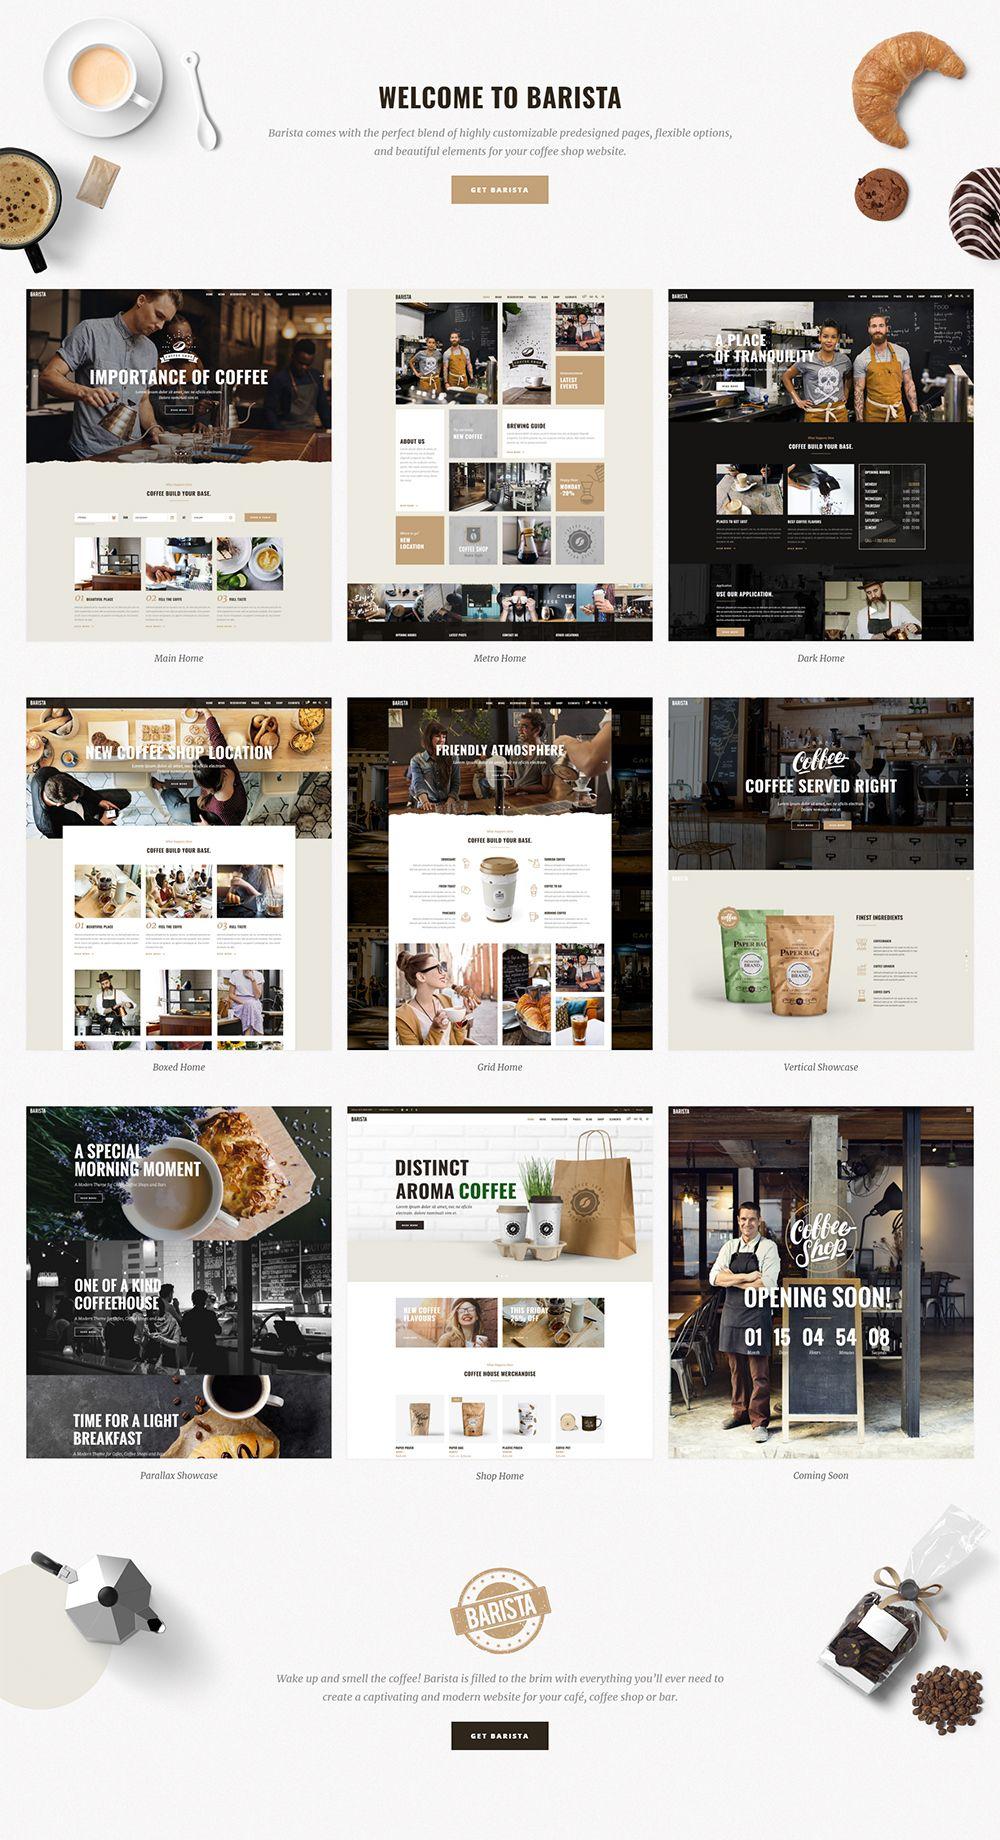 Barista Modern Wordpress Theme For Cafes Coffee Shops And Bars Modern Wordpress Themes Coffee Shop Cafe Website